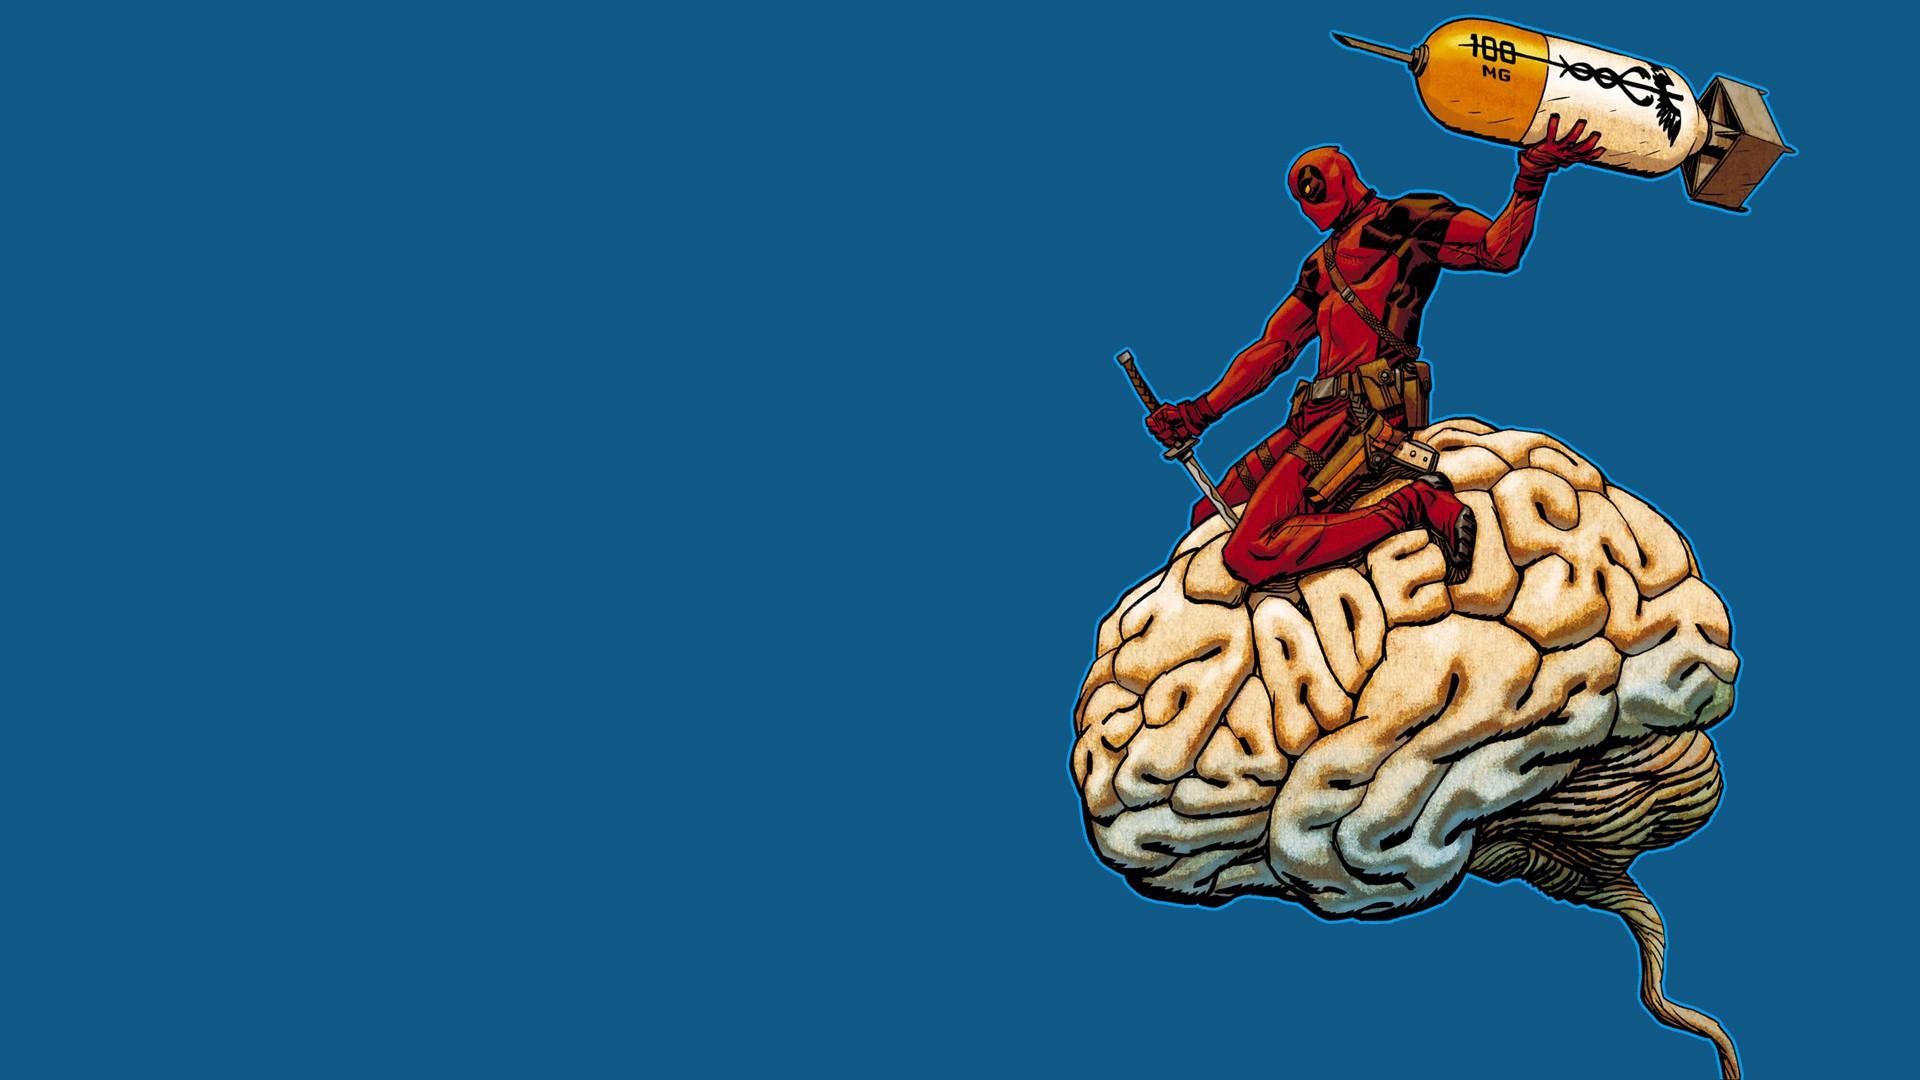 Deadpool Comic Art Brain 1920x1080